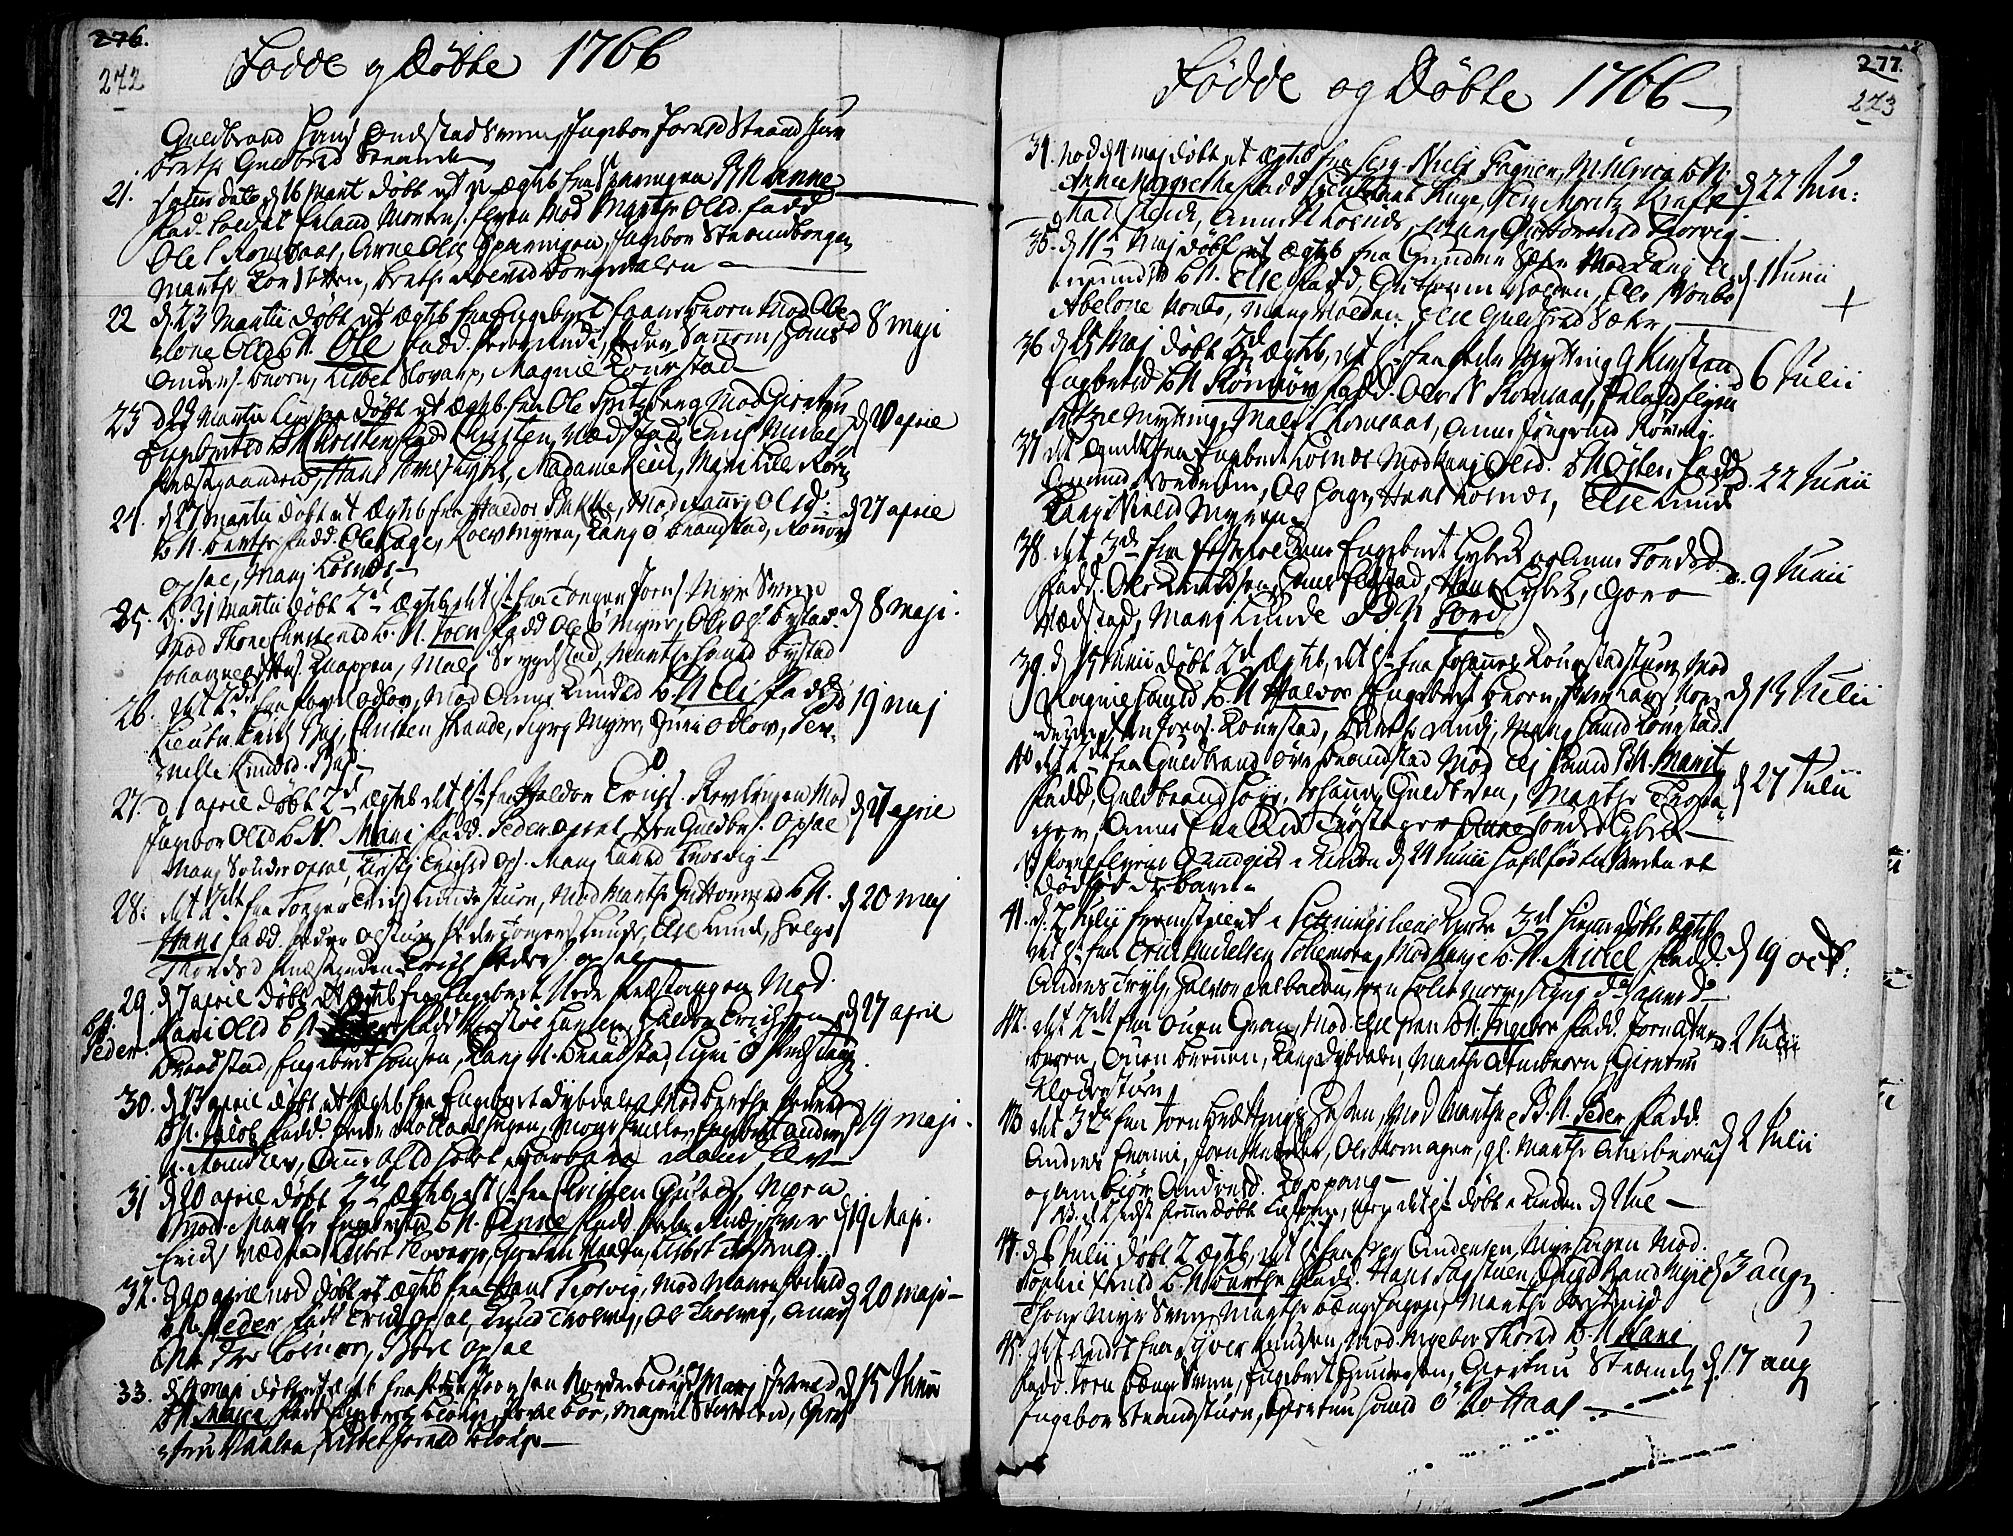 SAH, Ringebu prestekontor, Ministerialbok nr. 2, 1734-1780, s. 272-273